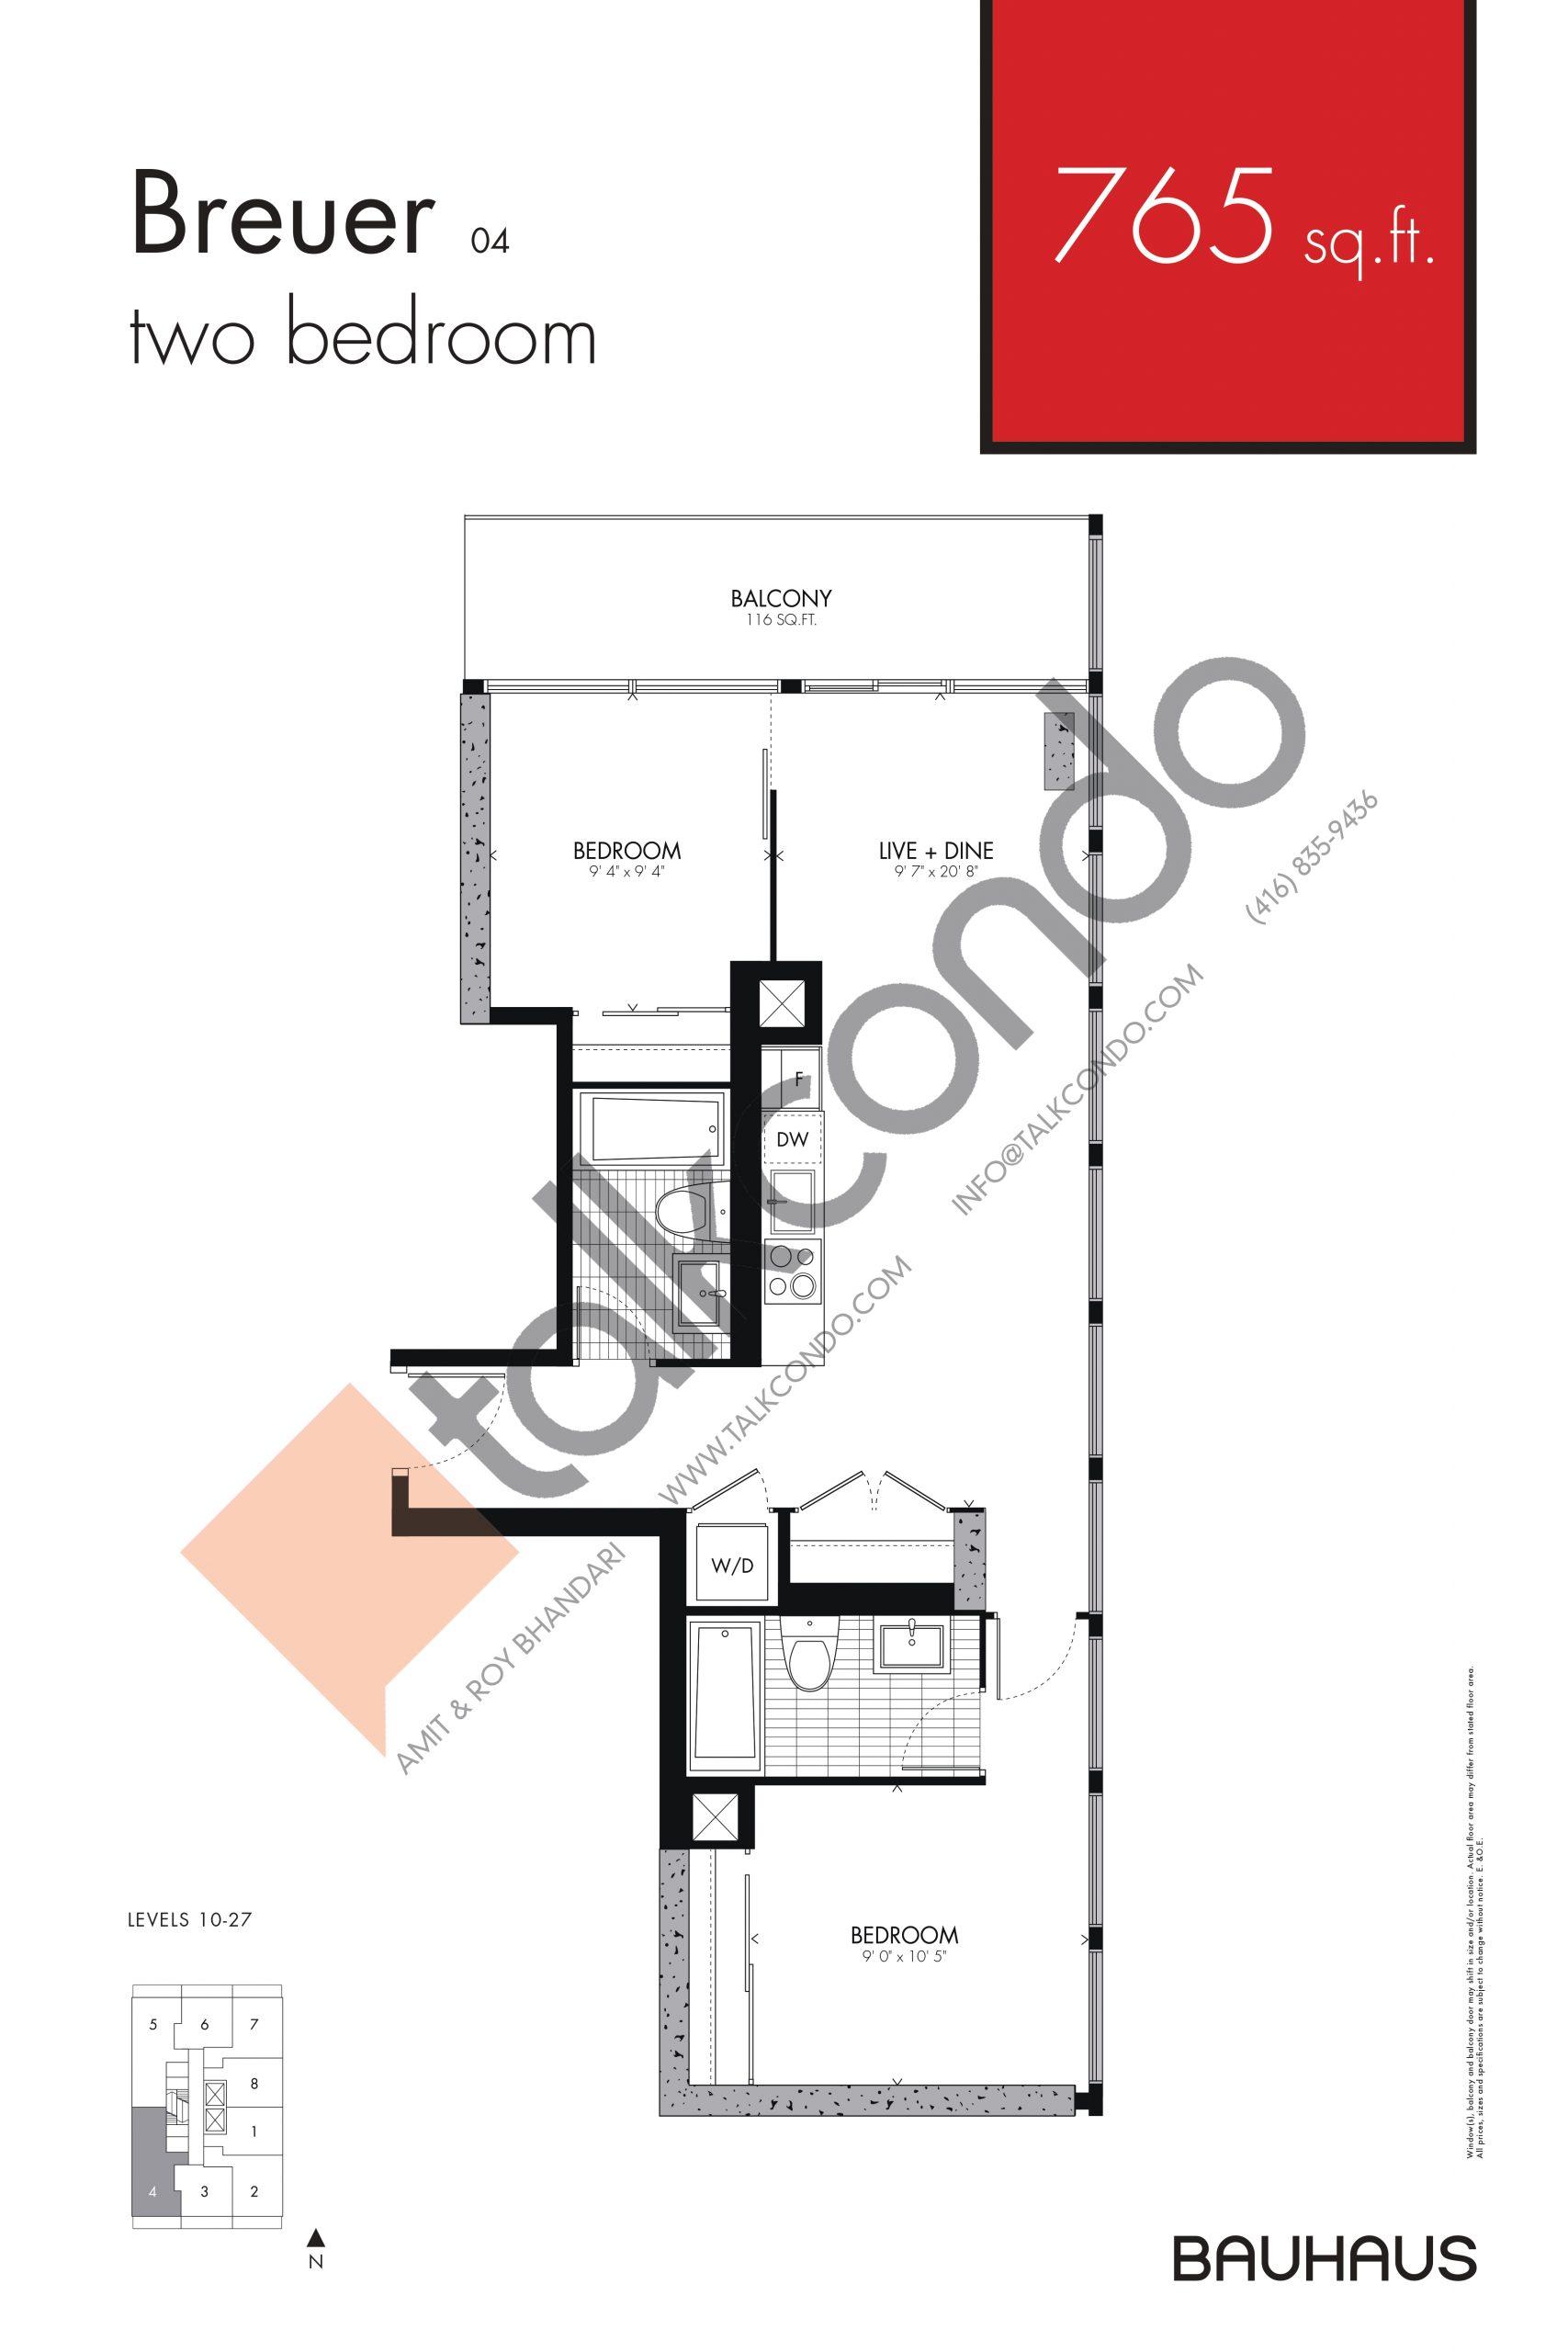 Breuer Floor Plan at Bauhaus Condos - 765 sq.ft